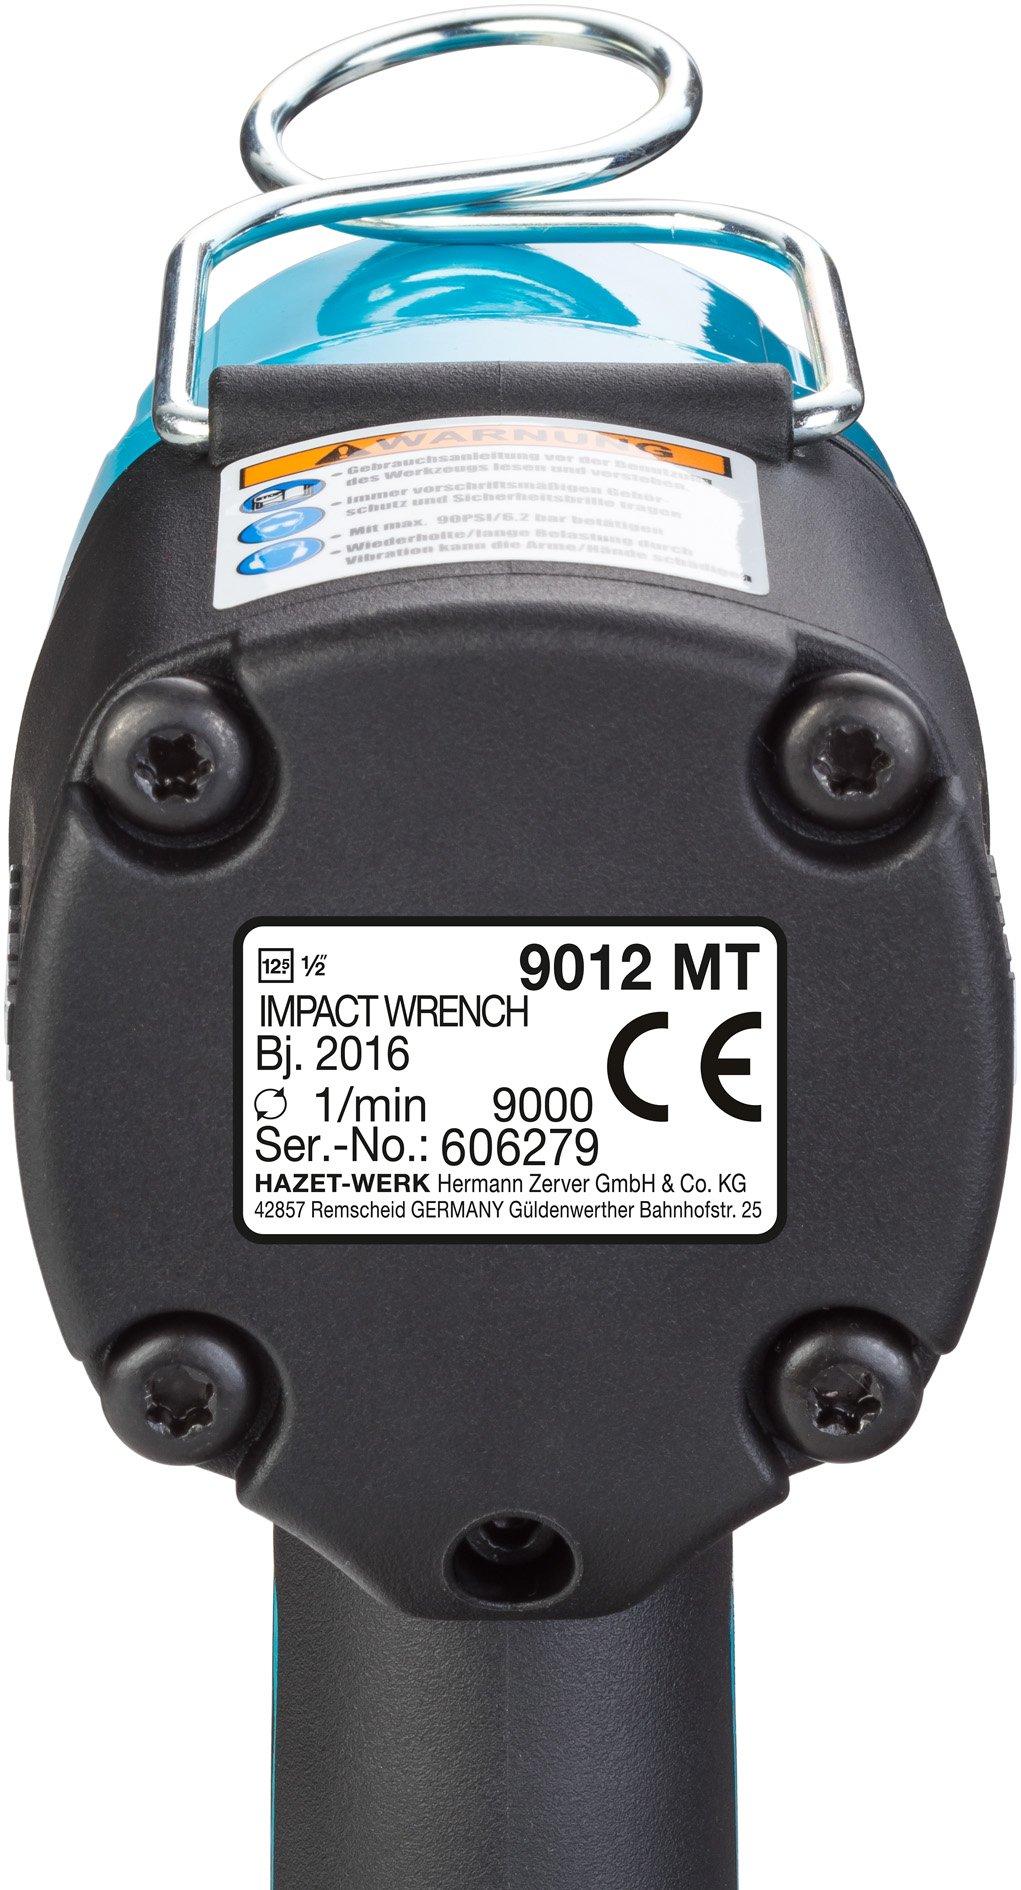 Hazet 9012MT Druckluft-Schlagschrauber, extra kurz, max. Lösemoment 1400 Nm, Vierkant 12,5 mm (1/2 Zoll)